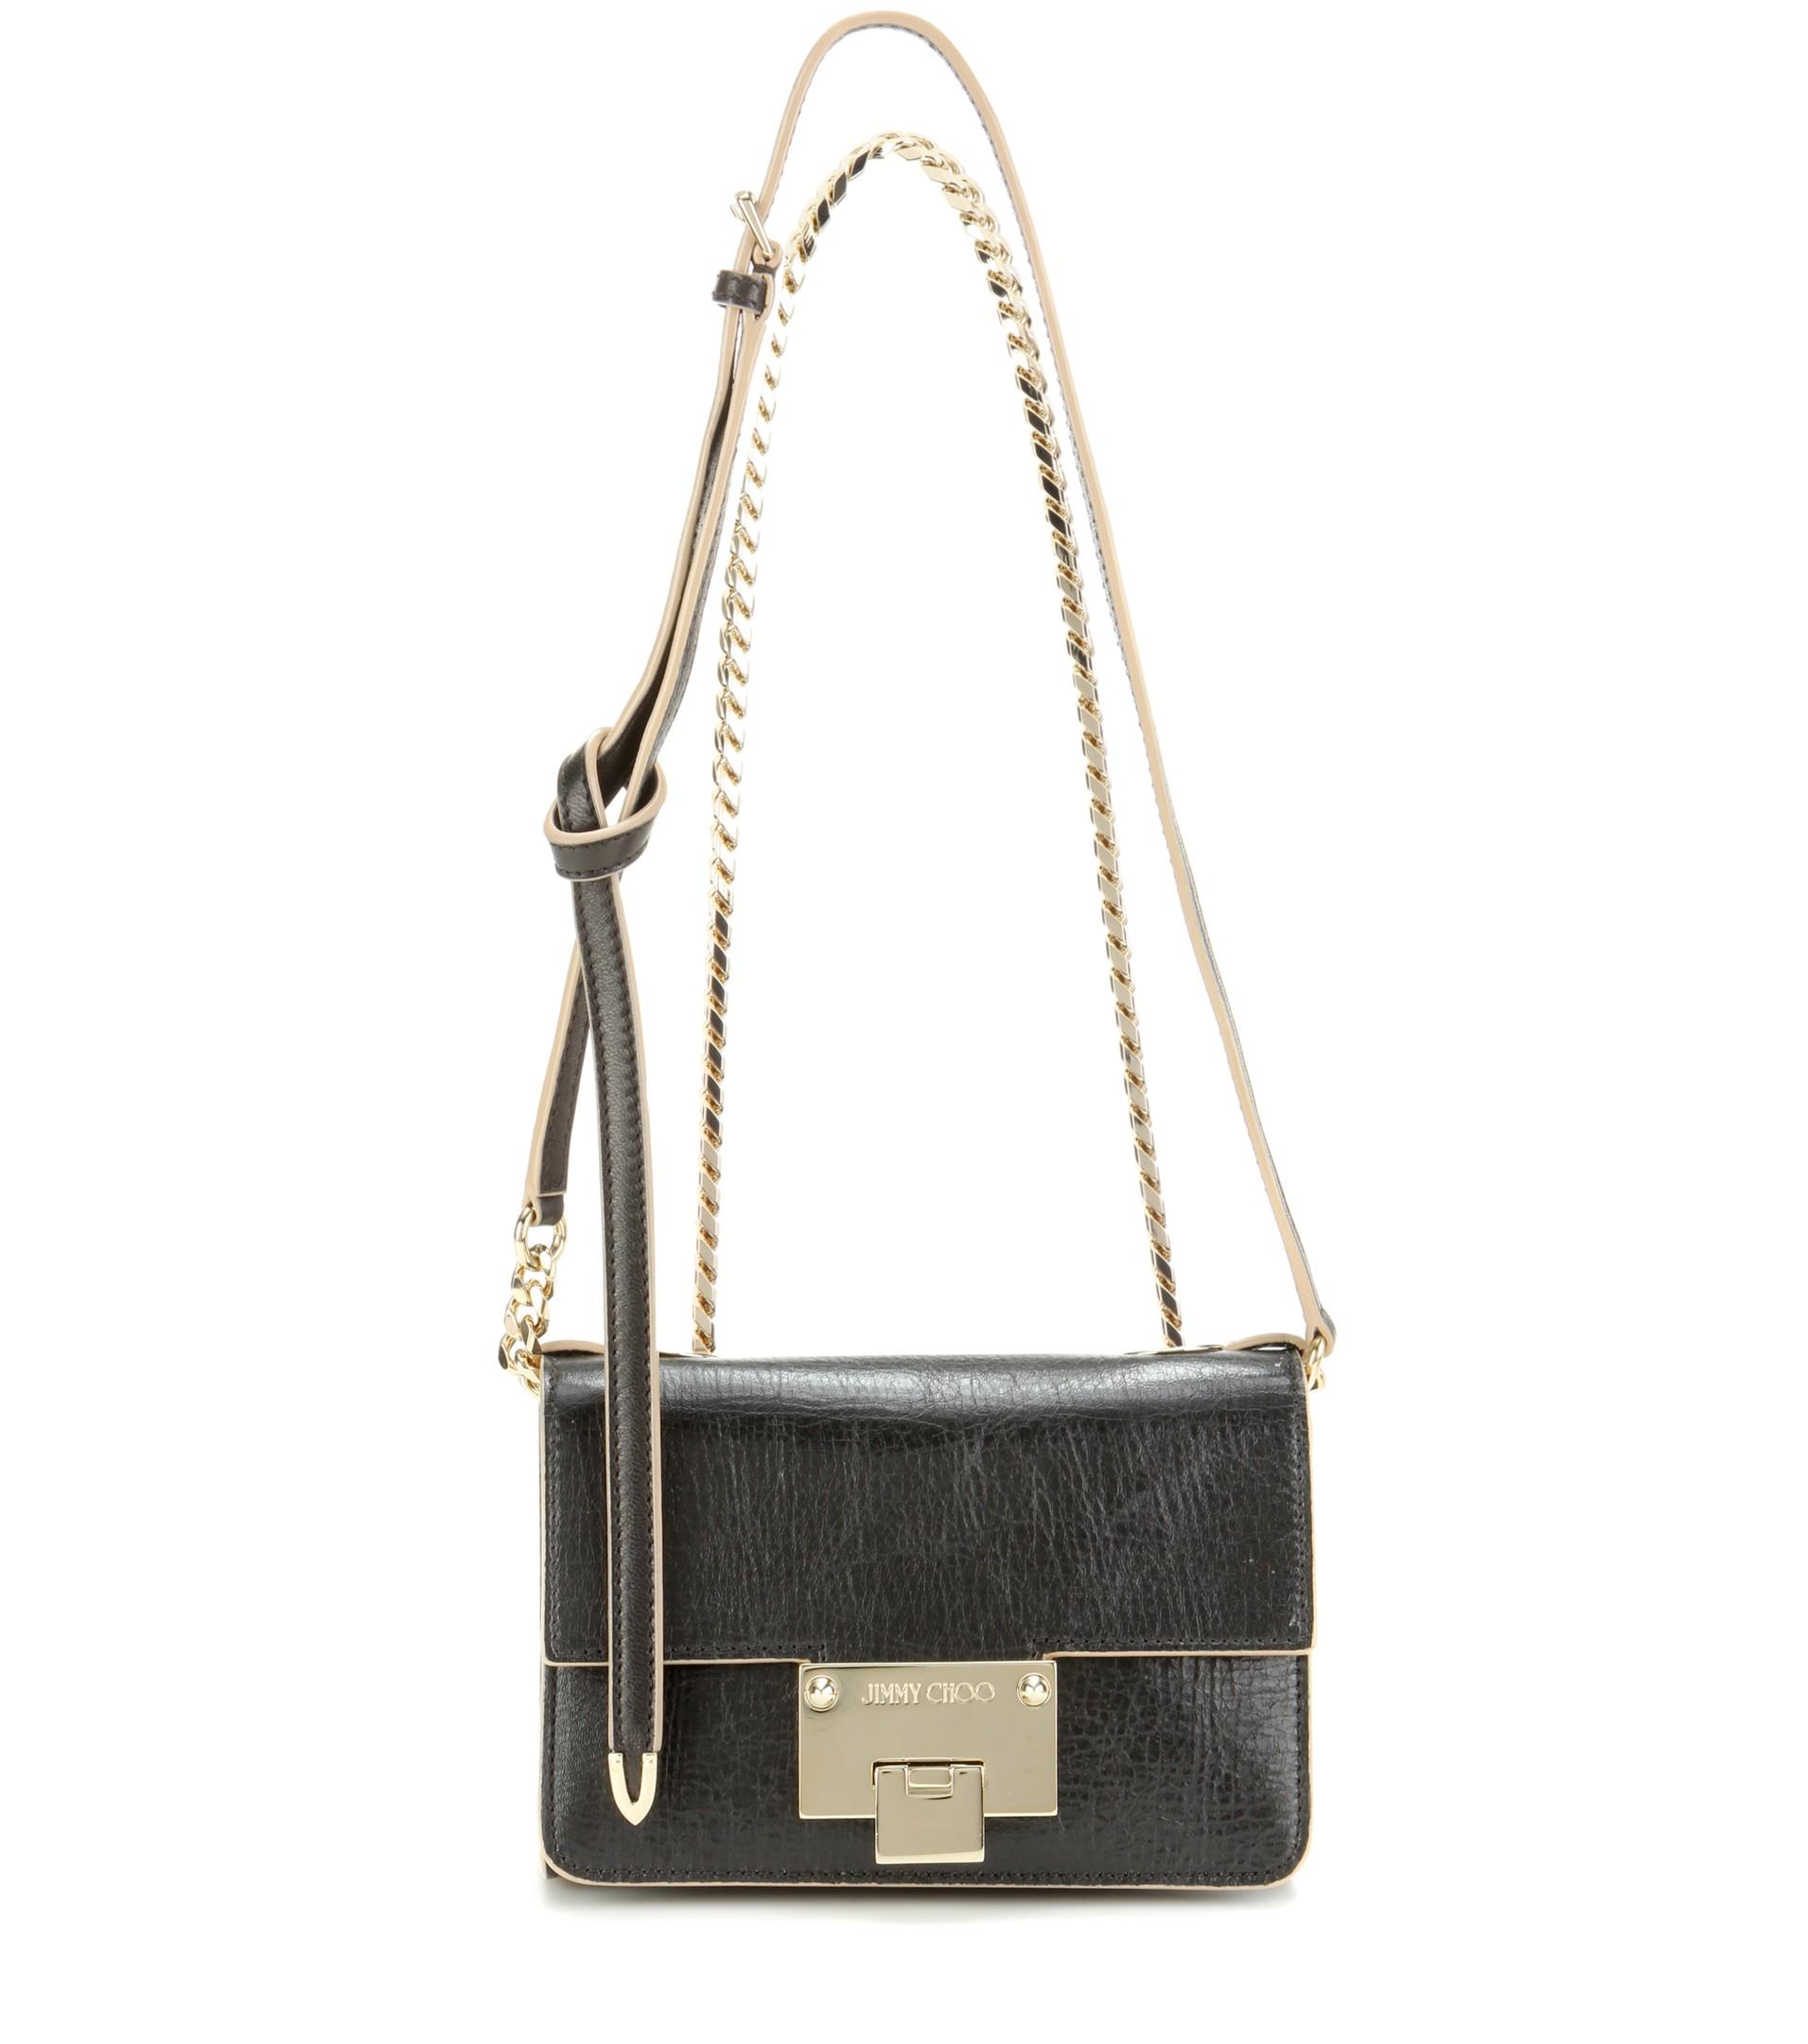 Lyst Jimmy Choo Rebel Soft Mini Leather Shoulder Bag In Black. Tuscany  Leather Tl Bag Soft Shoulder With Tel Detail Red Tl141223 44e45eb1dfcad